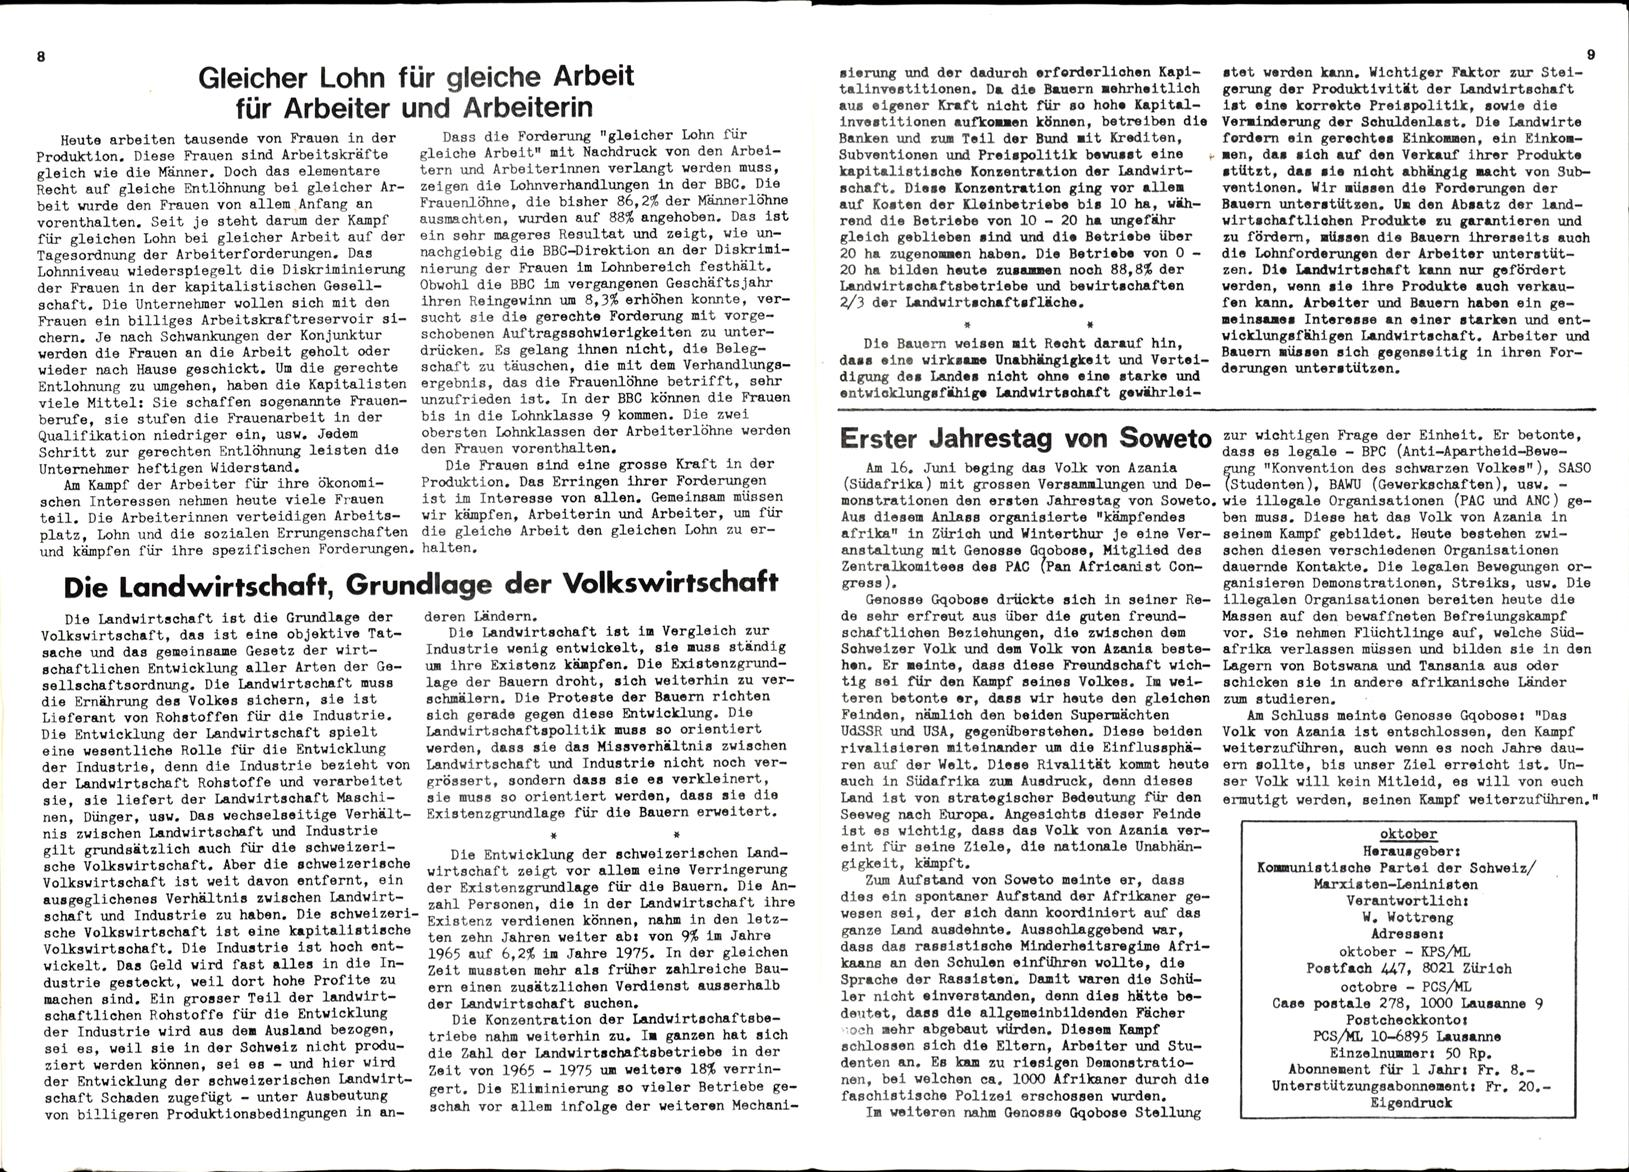 Schweiz_KPSML_Oktober_19770800_113_005